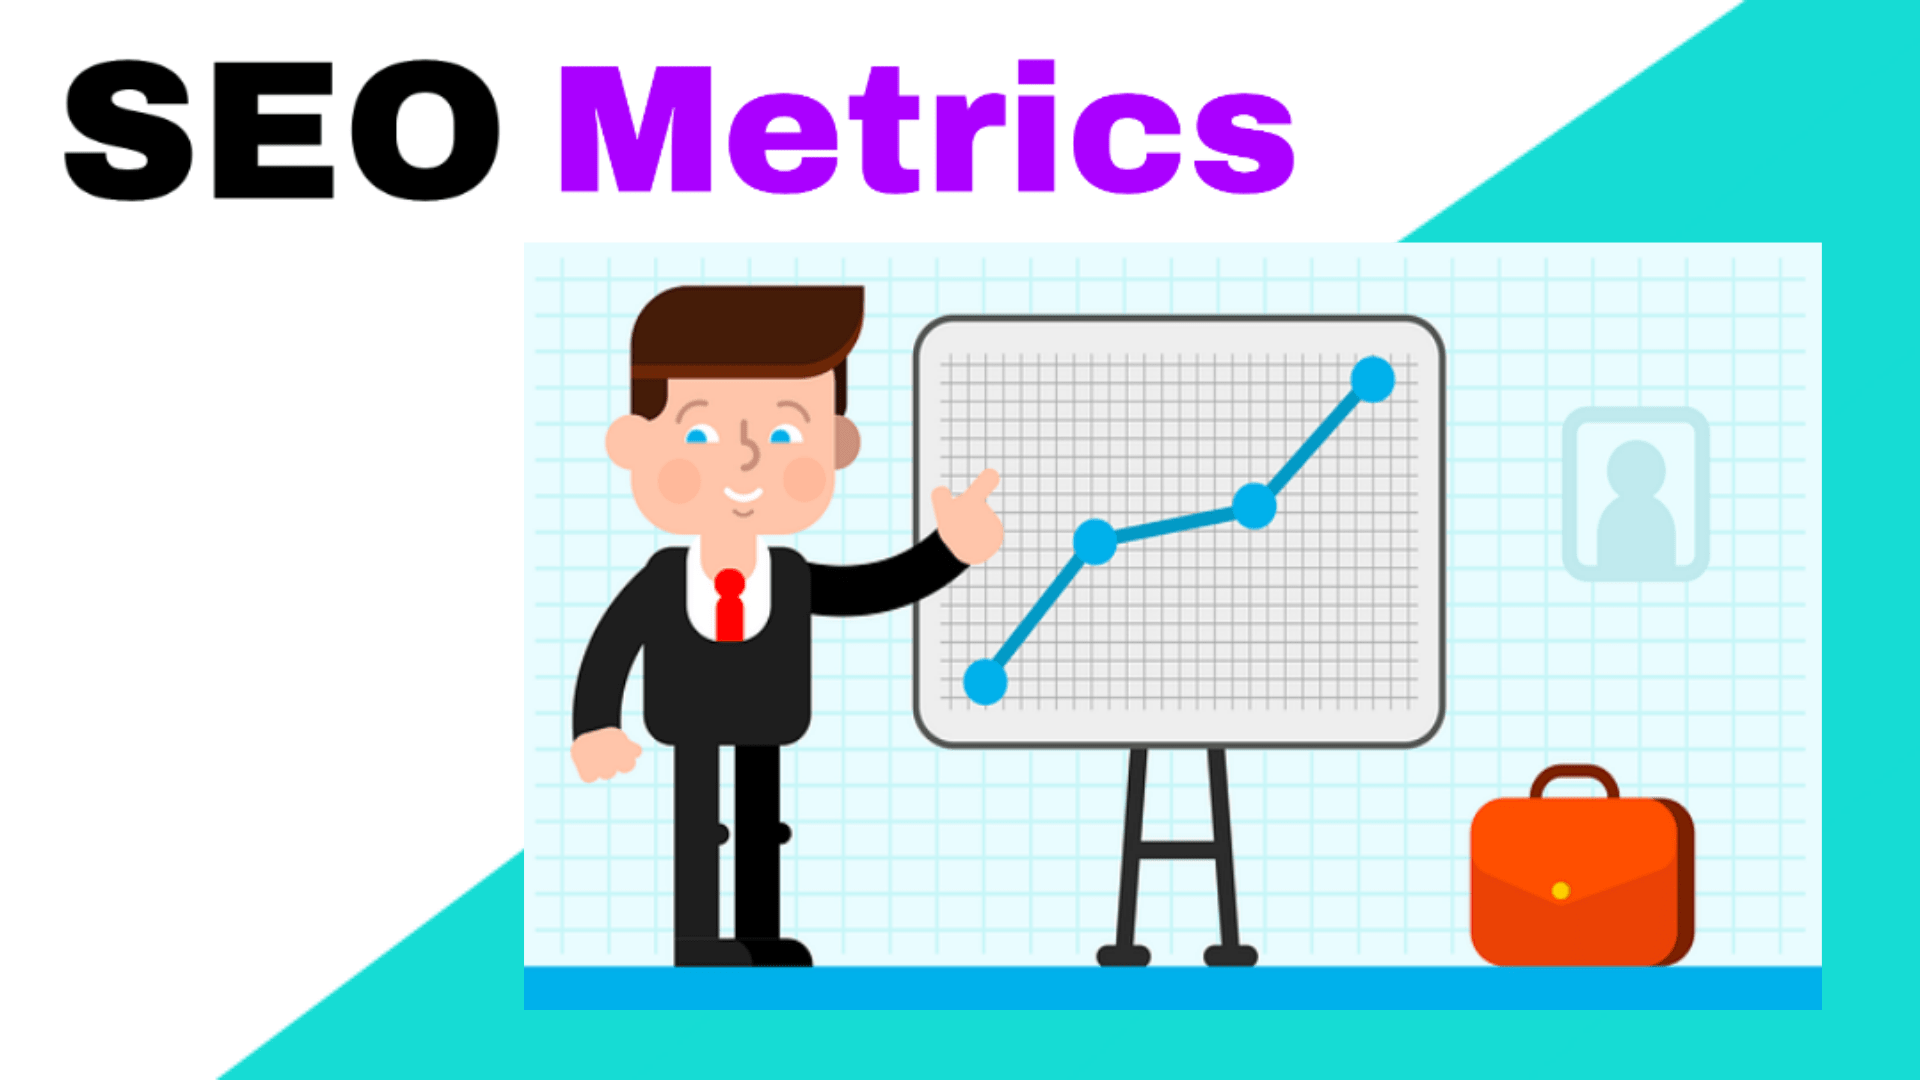 SEO Metrics to Track : Most Important 2